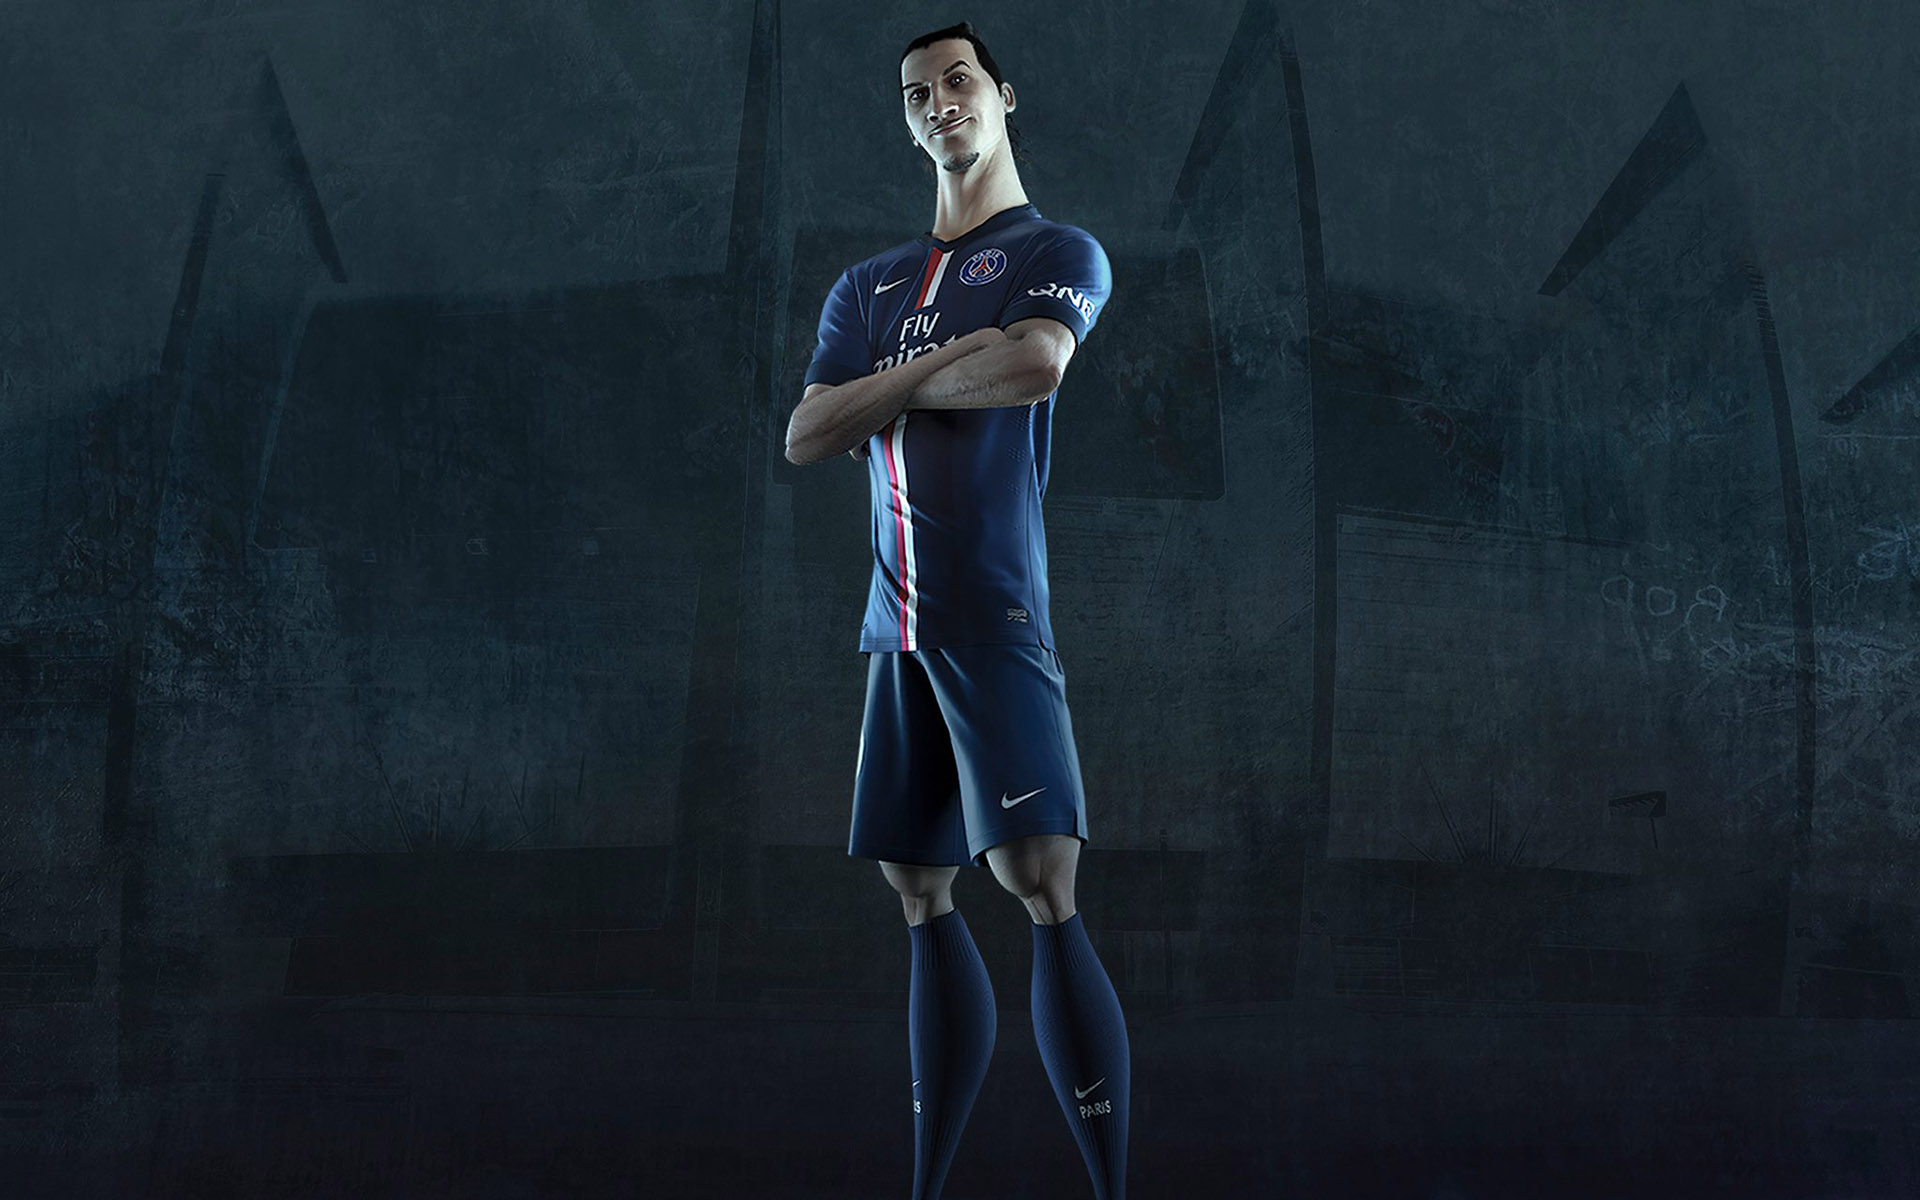 Zlatan Ibrahimovic PSG Jersey 2014 2015 Home Kit Wallpaper 1920x1200